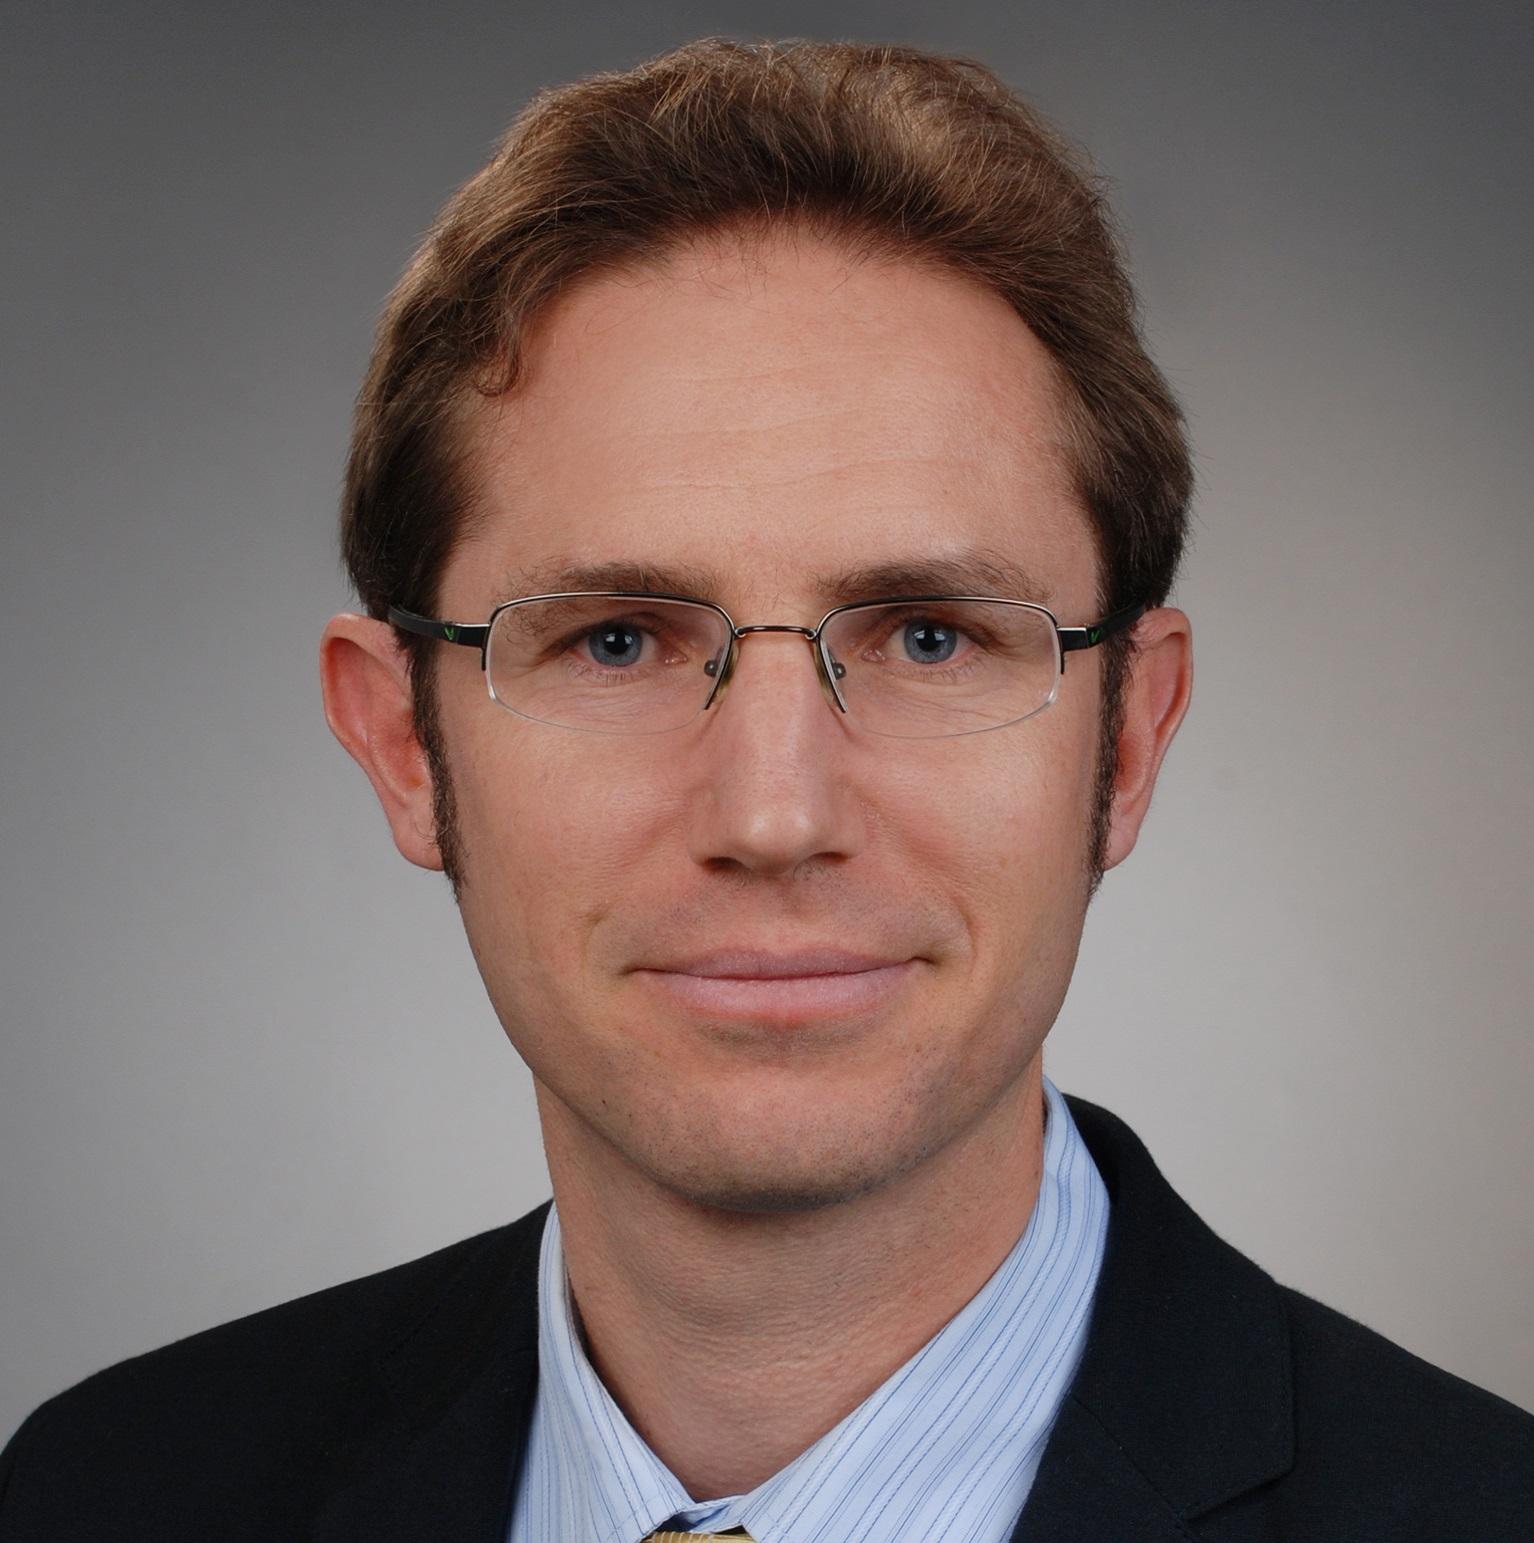 Dr. Philipp Guttenberg